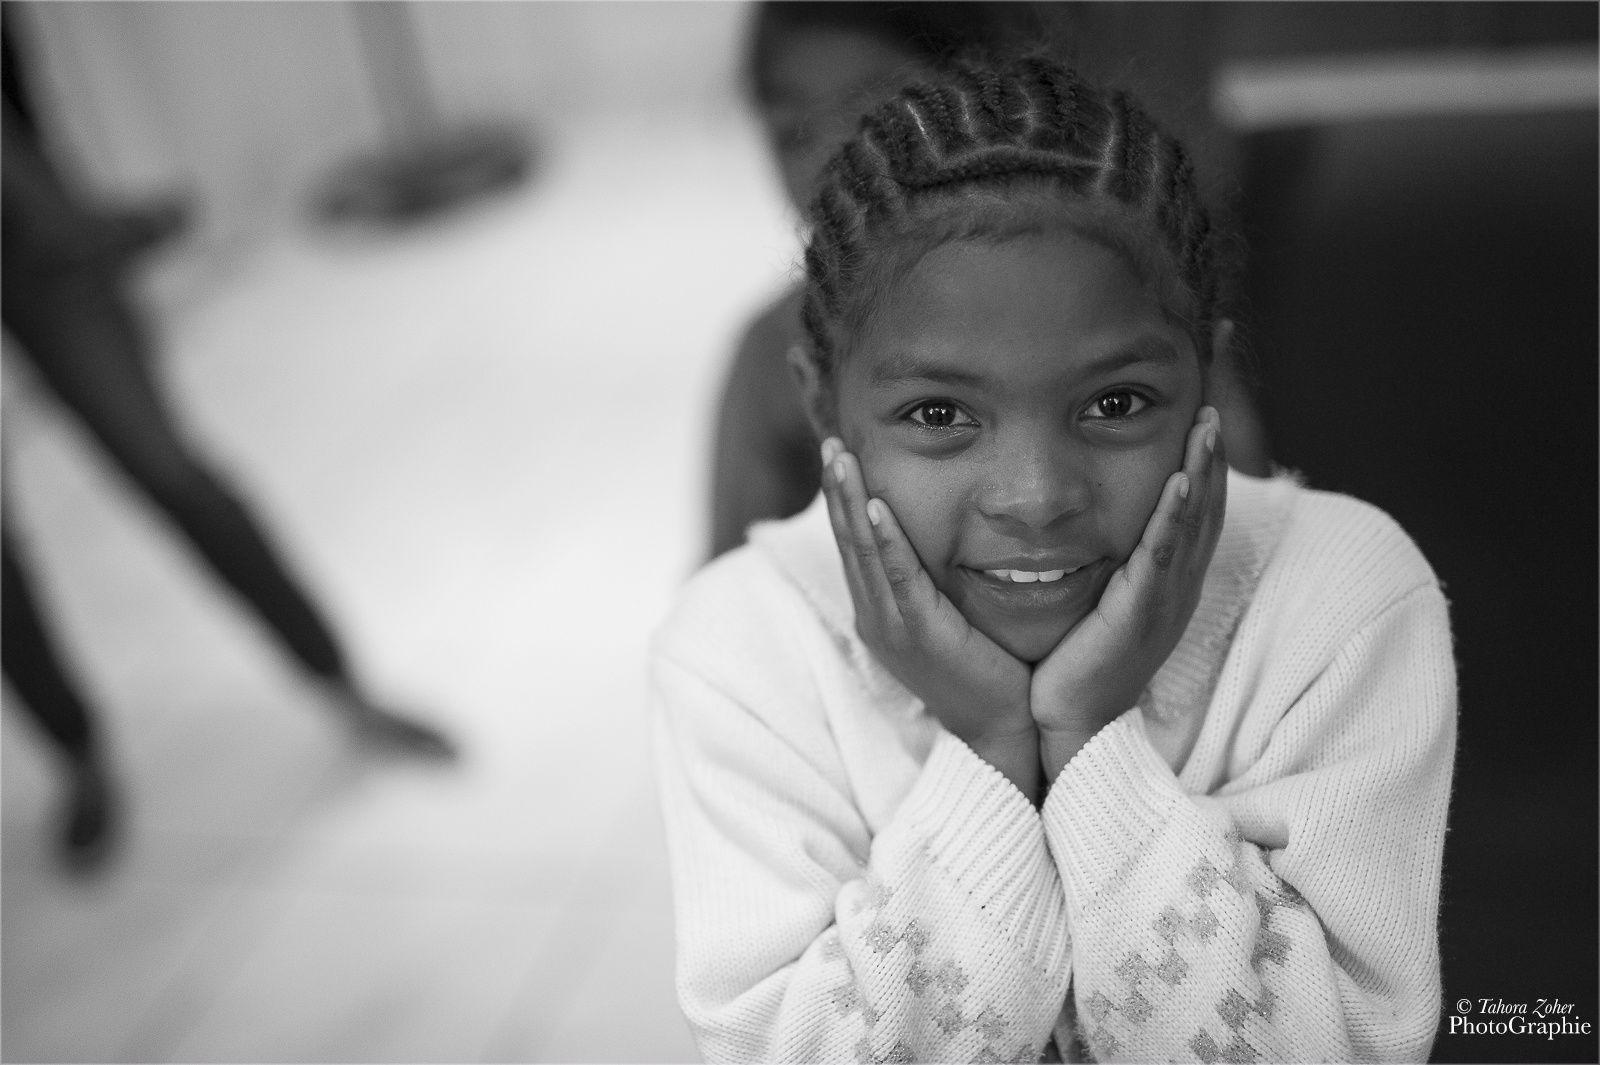 © Tahora Zoher PhotoGraphie - Le Toit des Orphelins / Ursula 8 ans / Antananarivo 2016 -